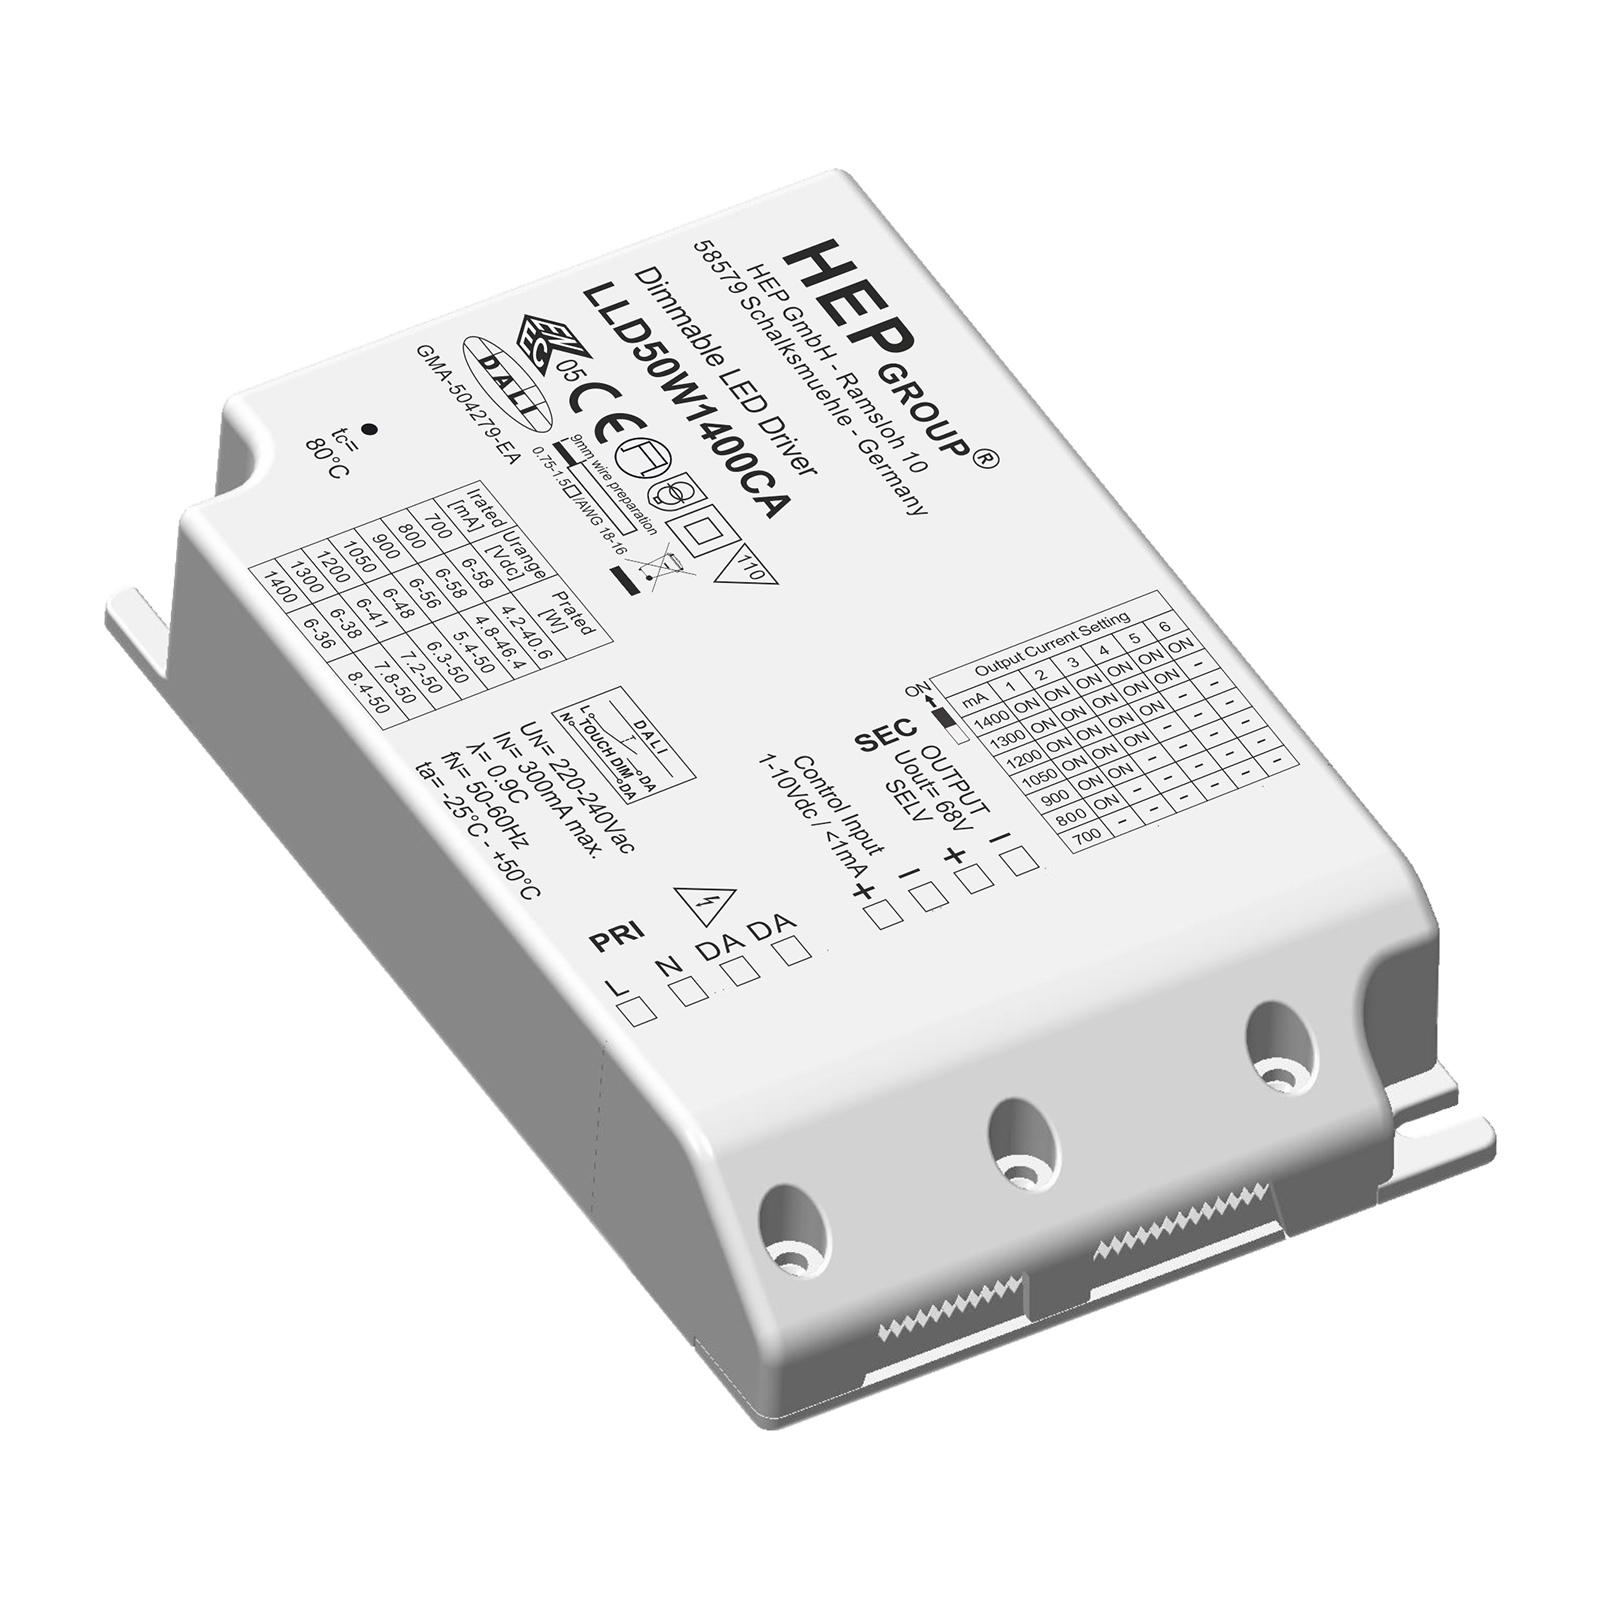 LED-Treiber LLD, 50 W, 1400 mA, dimmbar, CC